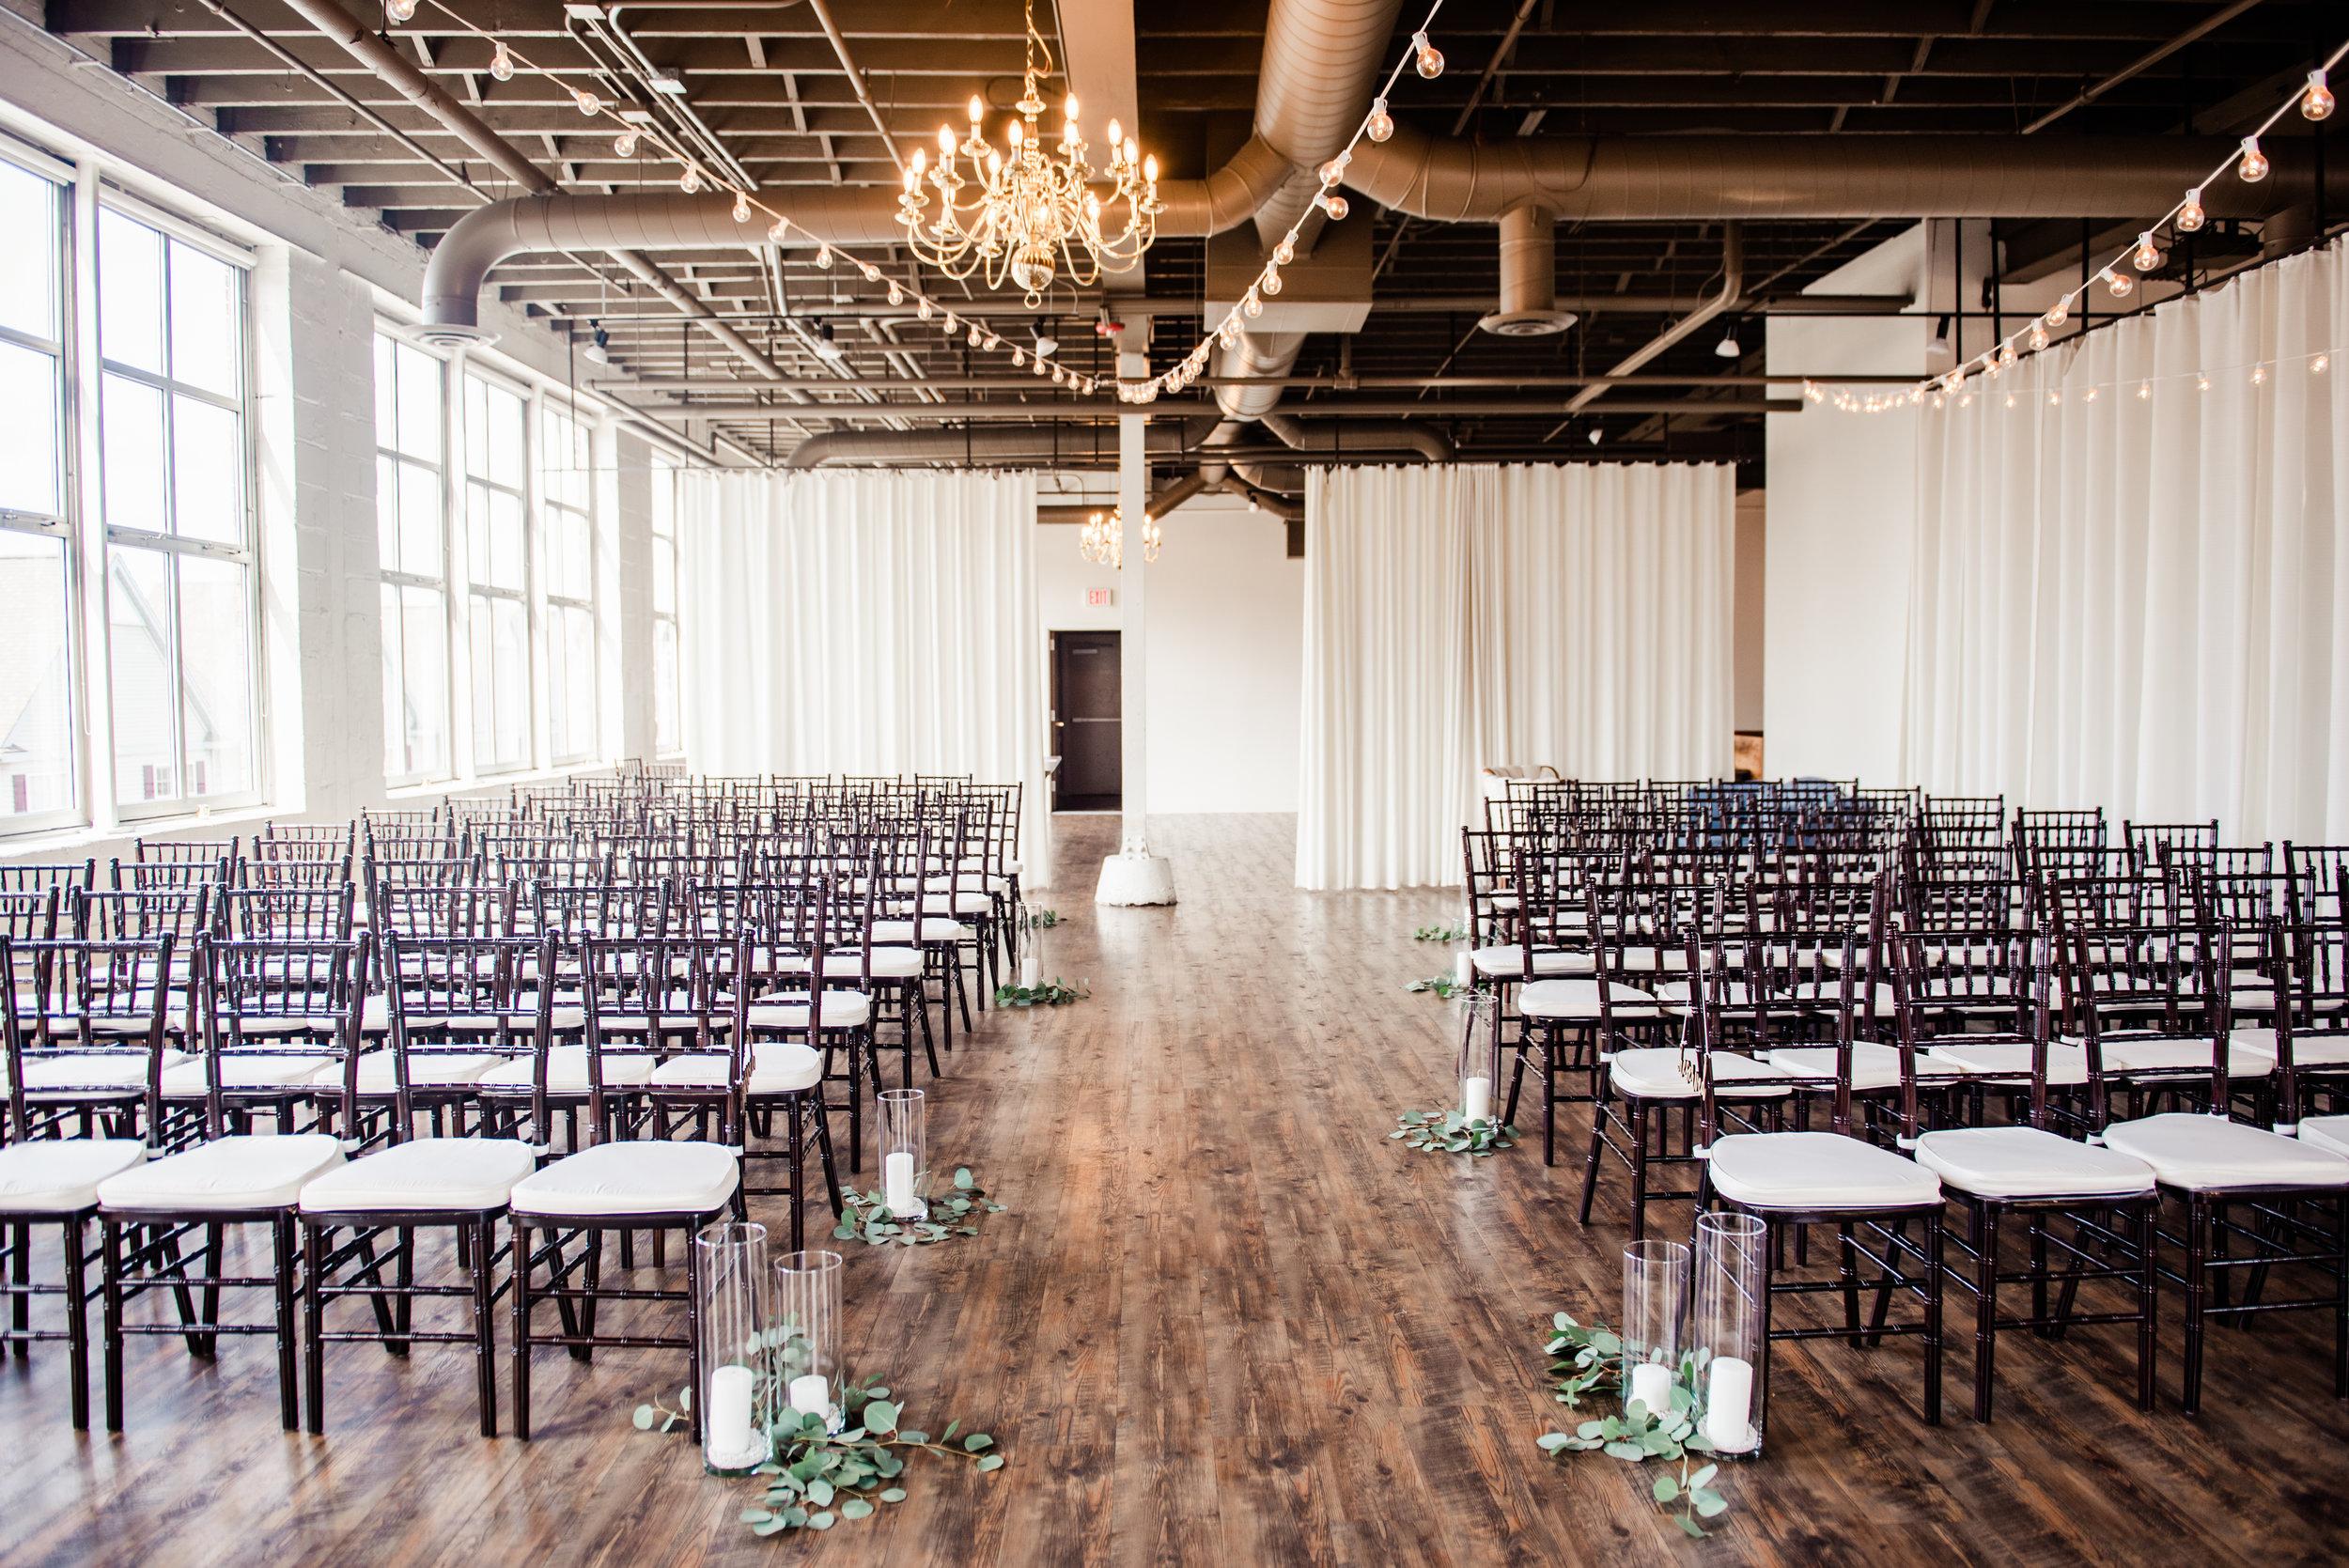 The_Arbor_Loft_Rochester_Wedding_JILL_STUDIO_Rochester_NY_Photographer_151045.jpg